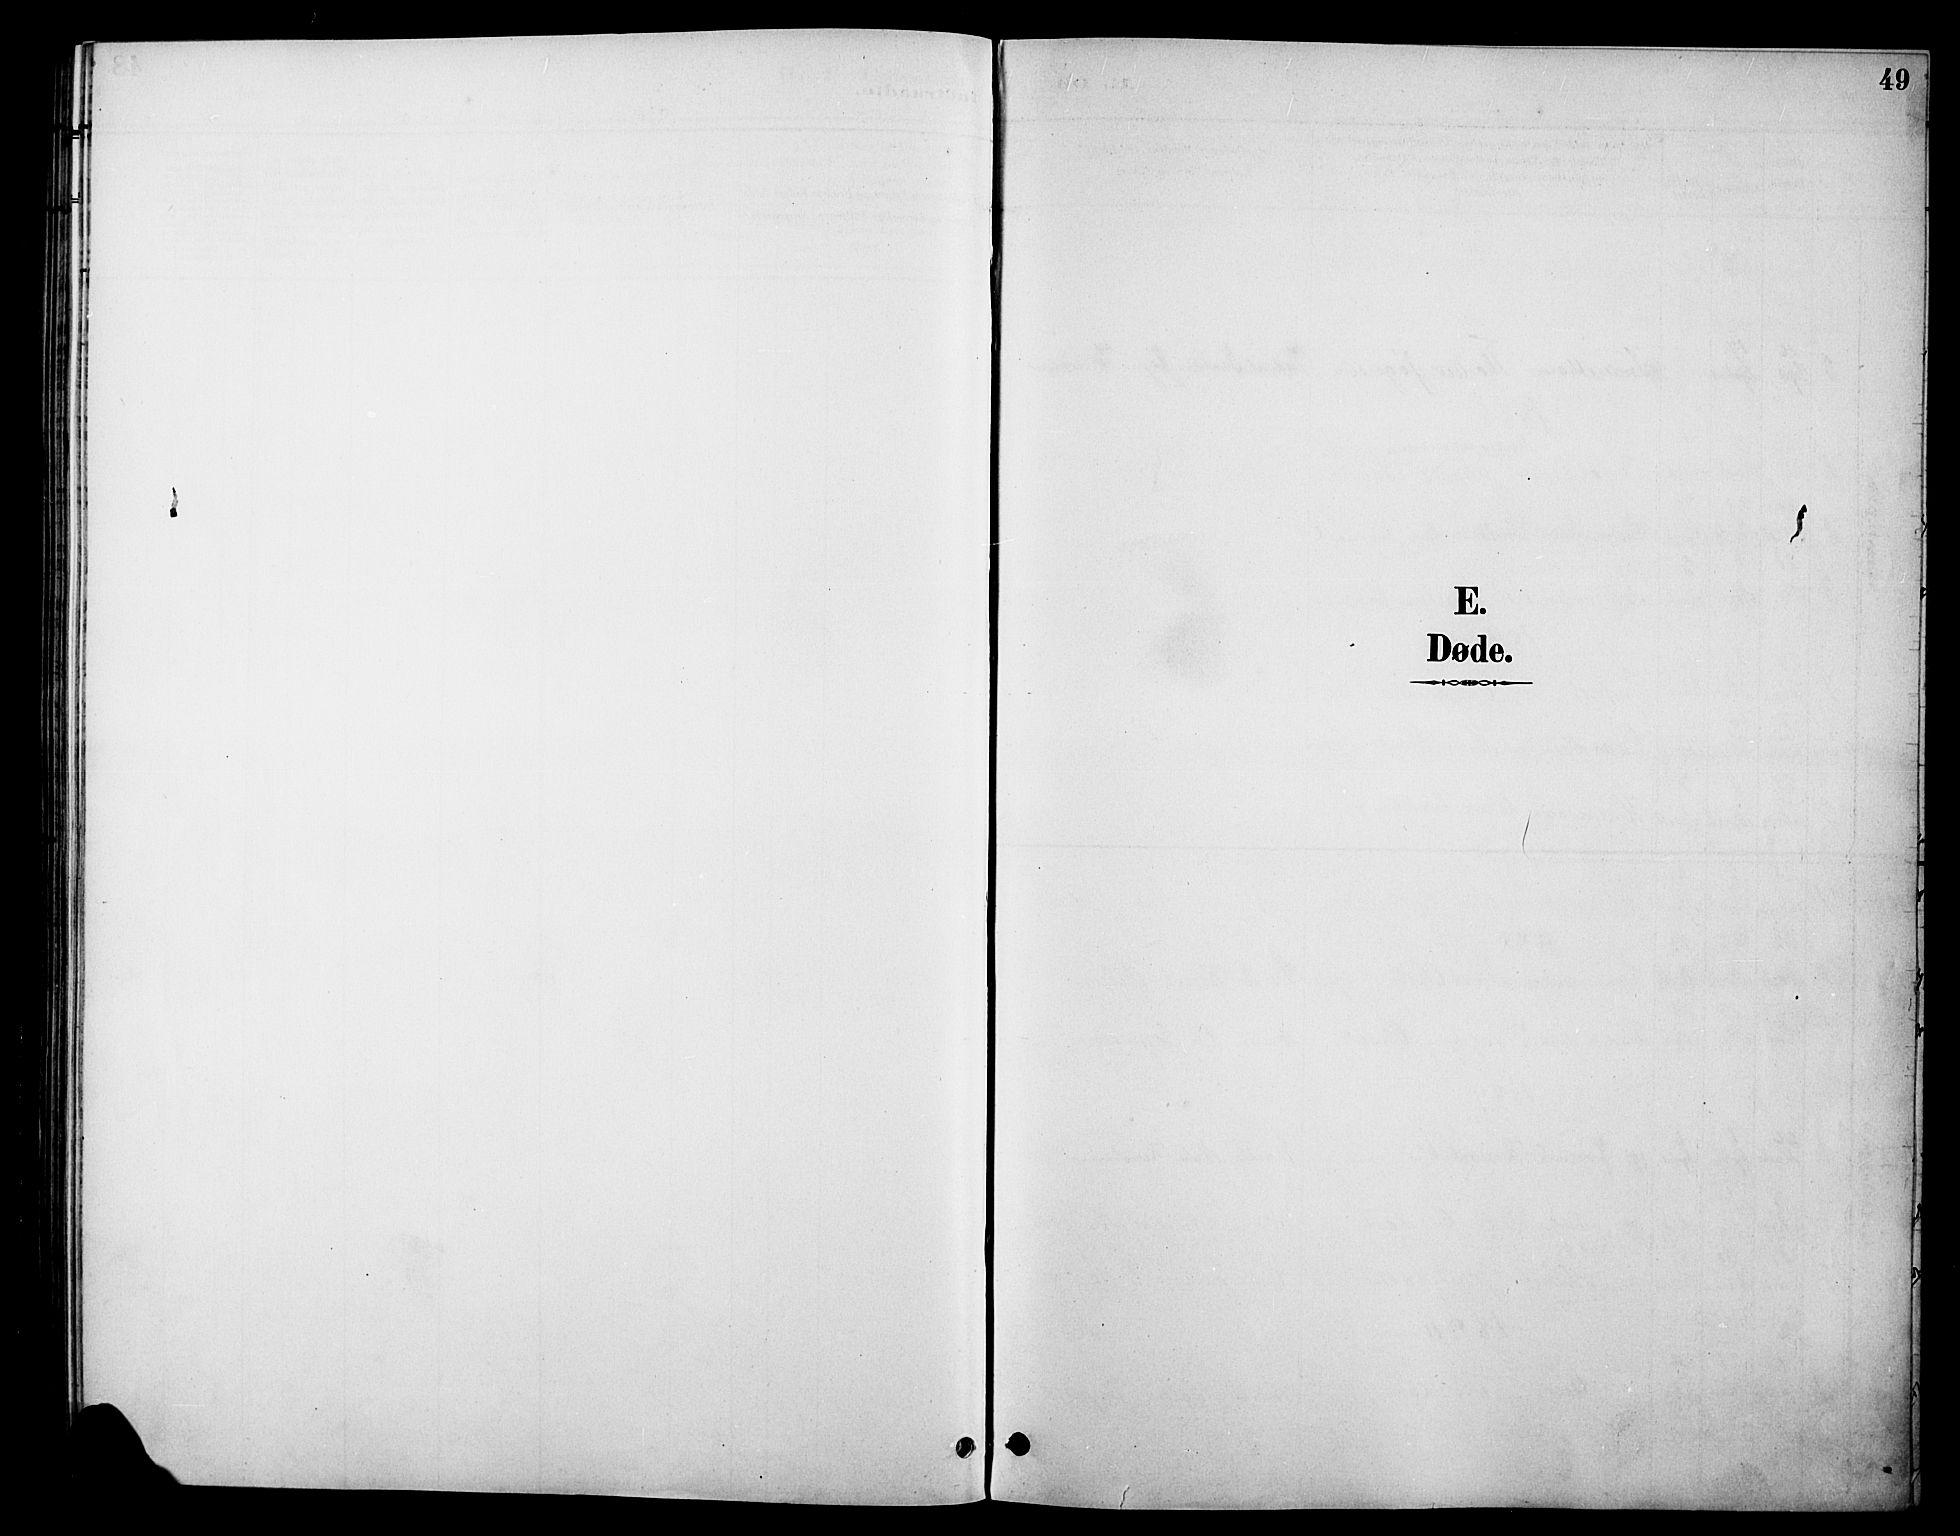 SAH, Øystre Slidre prestekontor, Klokkerbok nr. 6, 1887-1916, s. 49